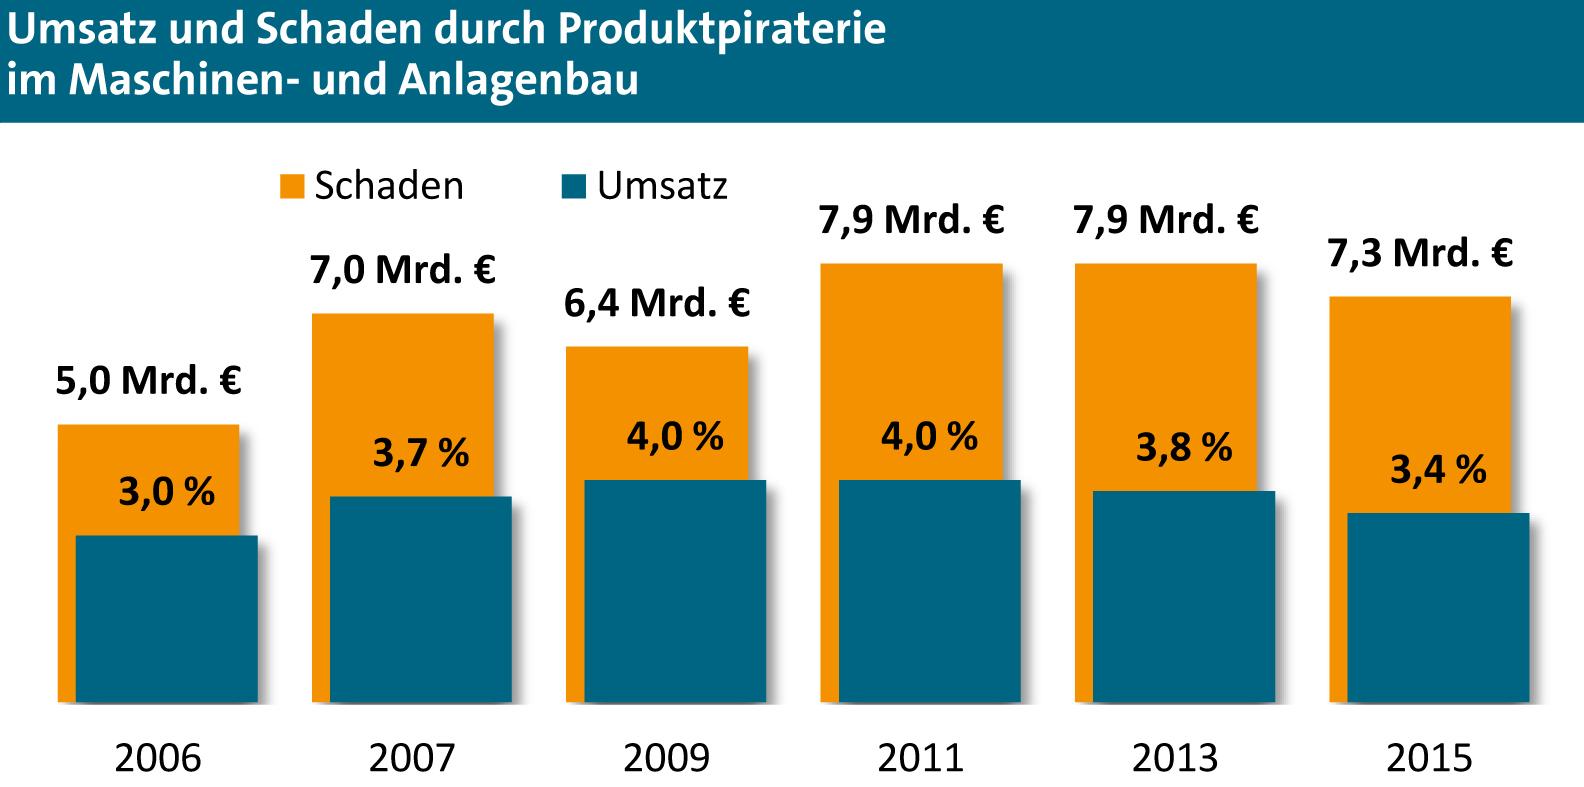 VDMA-Umfrage: 7,3Mrd.E Schaden durch Produktpiraterie